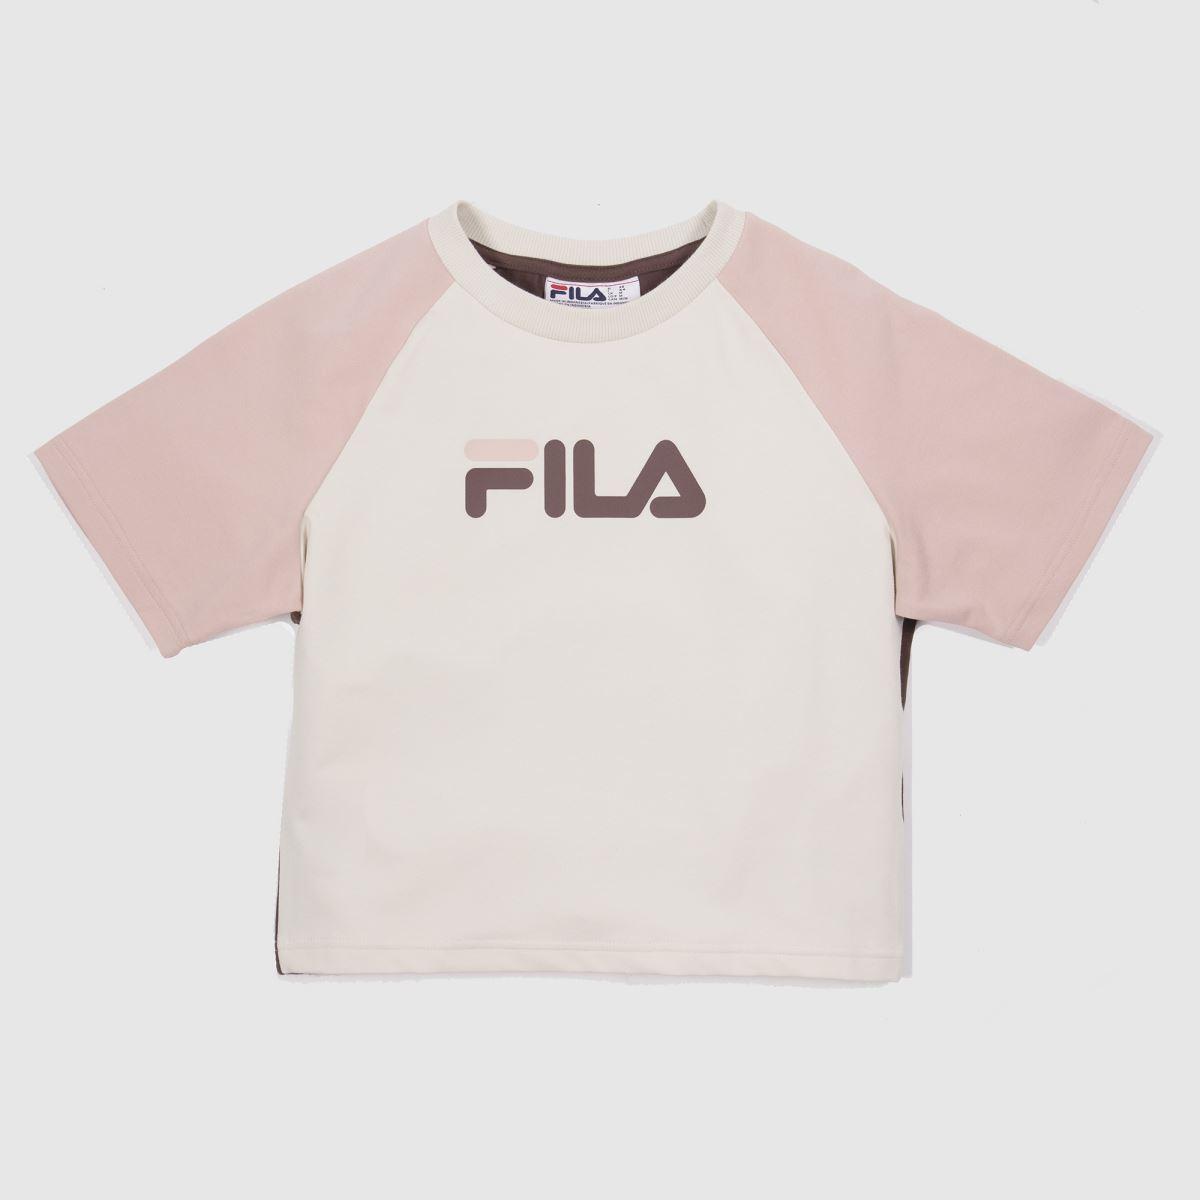 Fila White & Pink Aisha Fitted Crop Tee